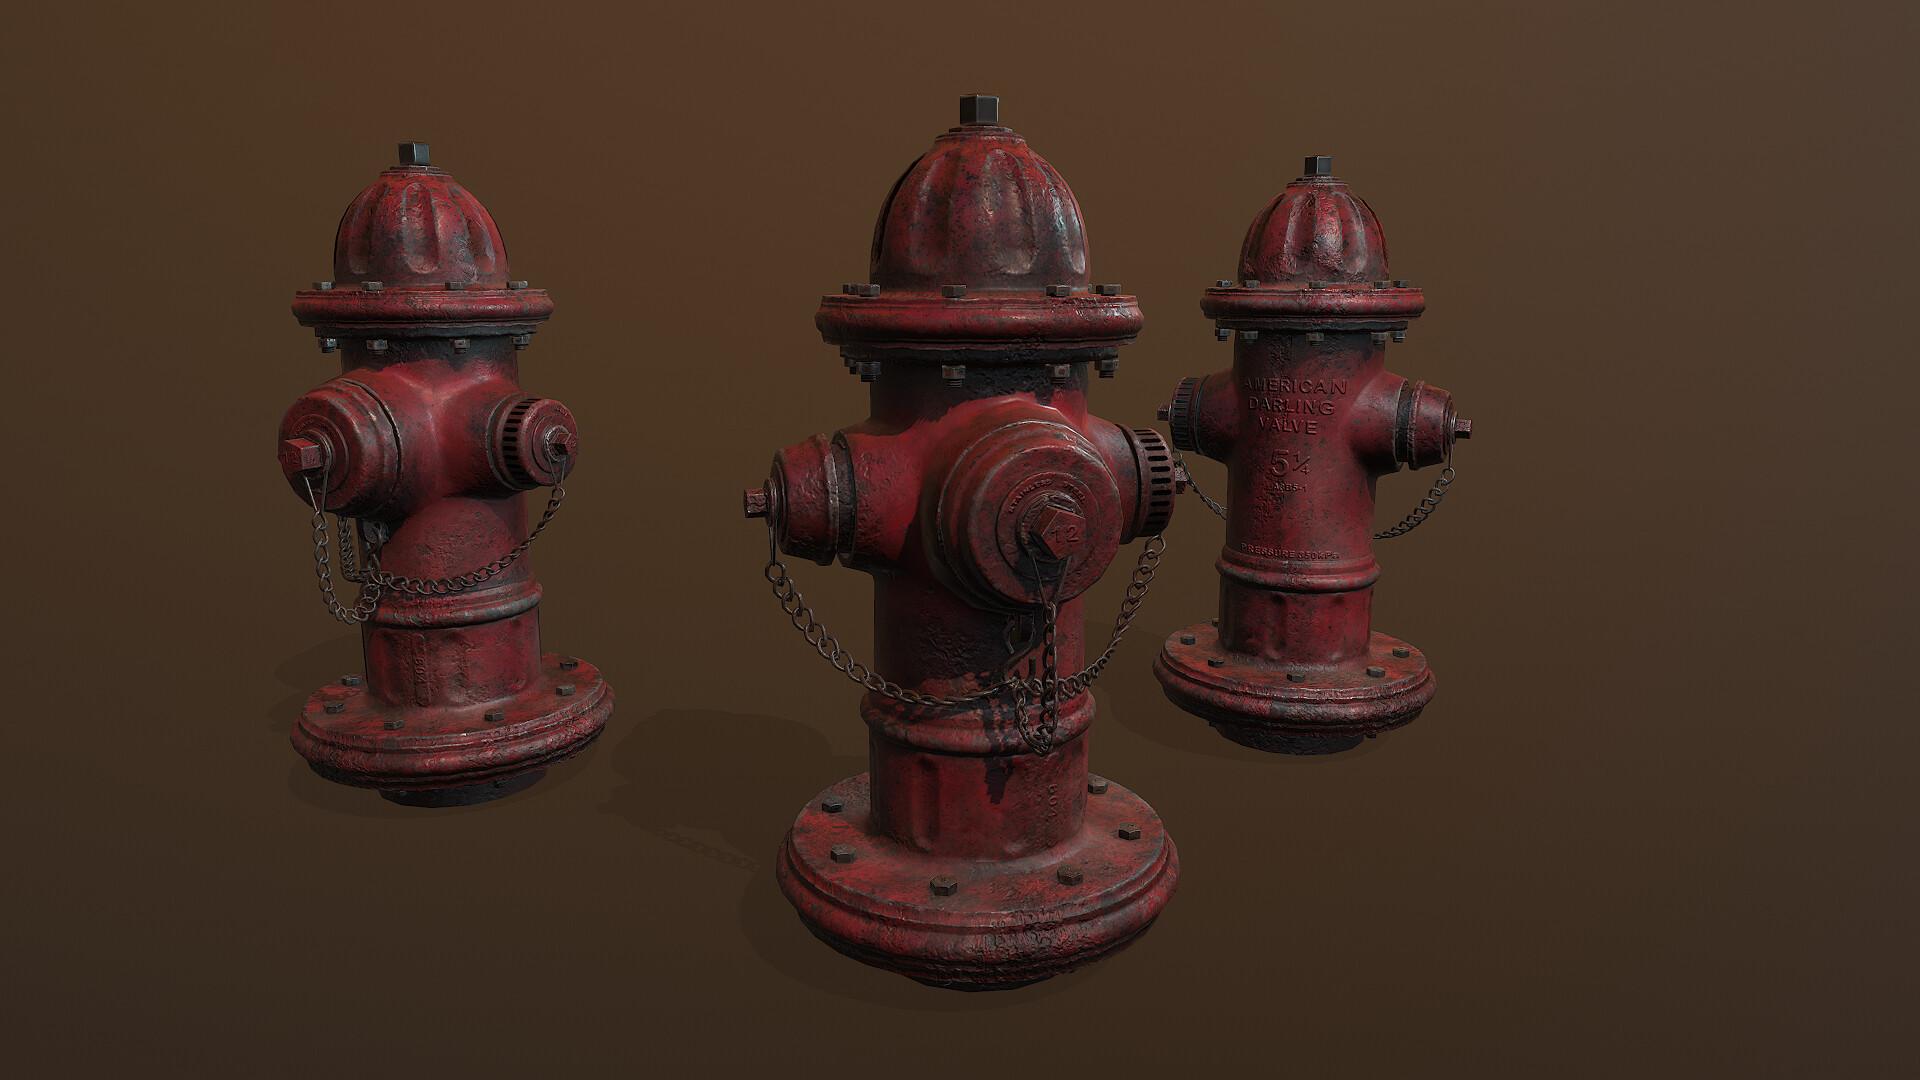 3D artwork of fire hydrants